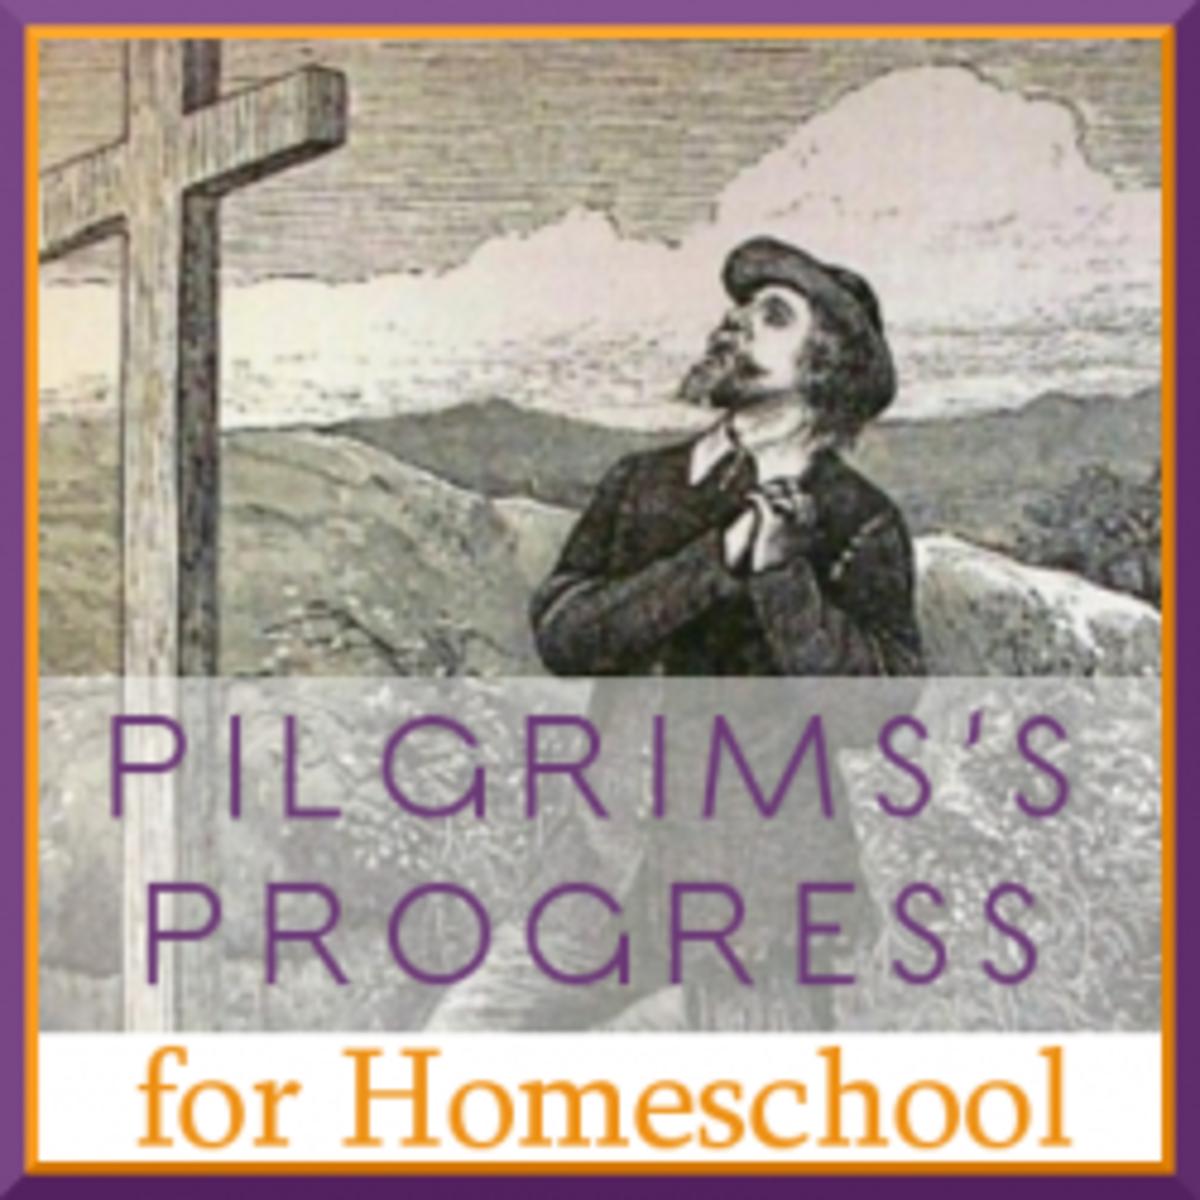 pilgrims-progress-homeschool-unit-study